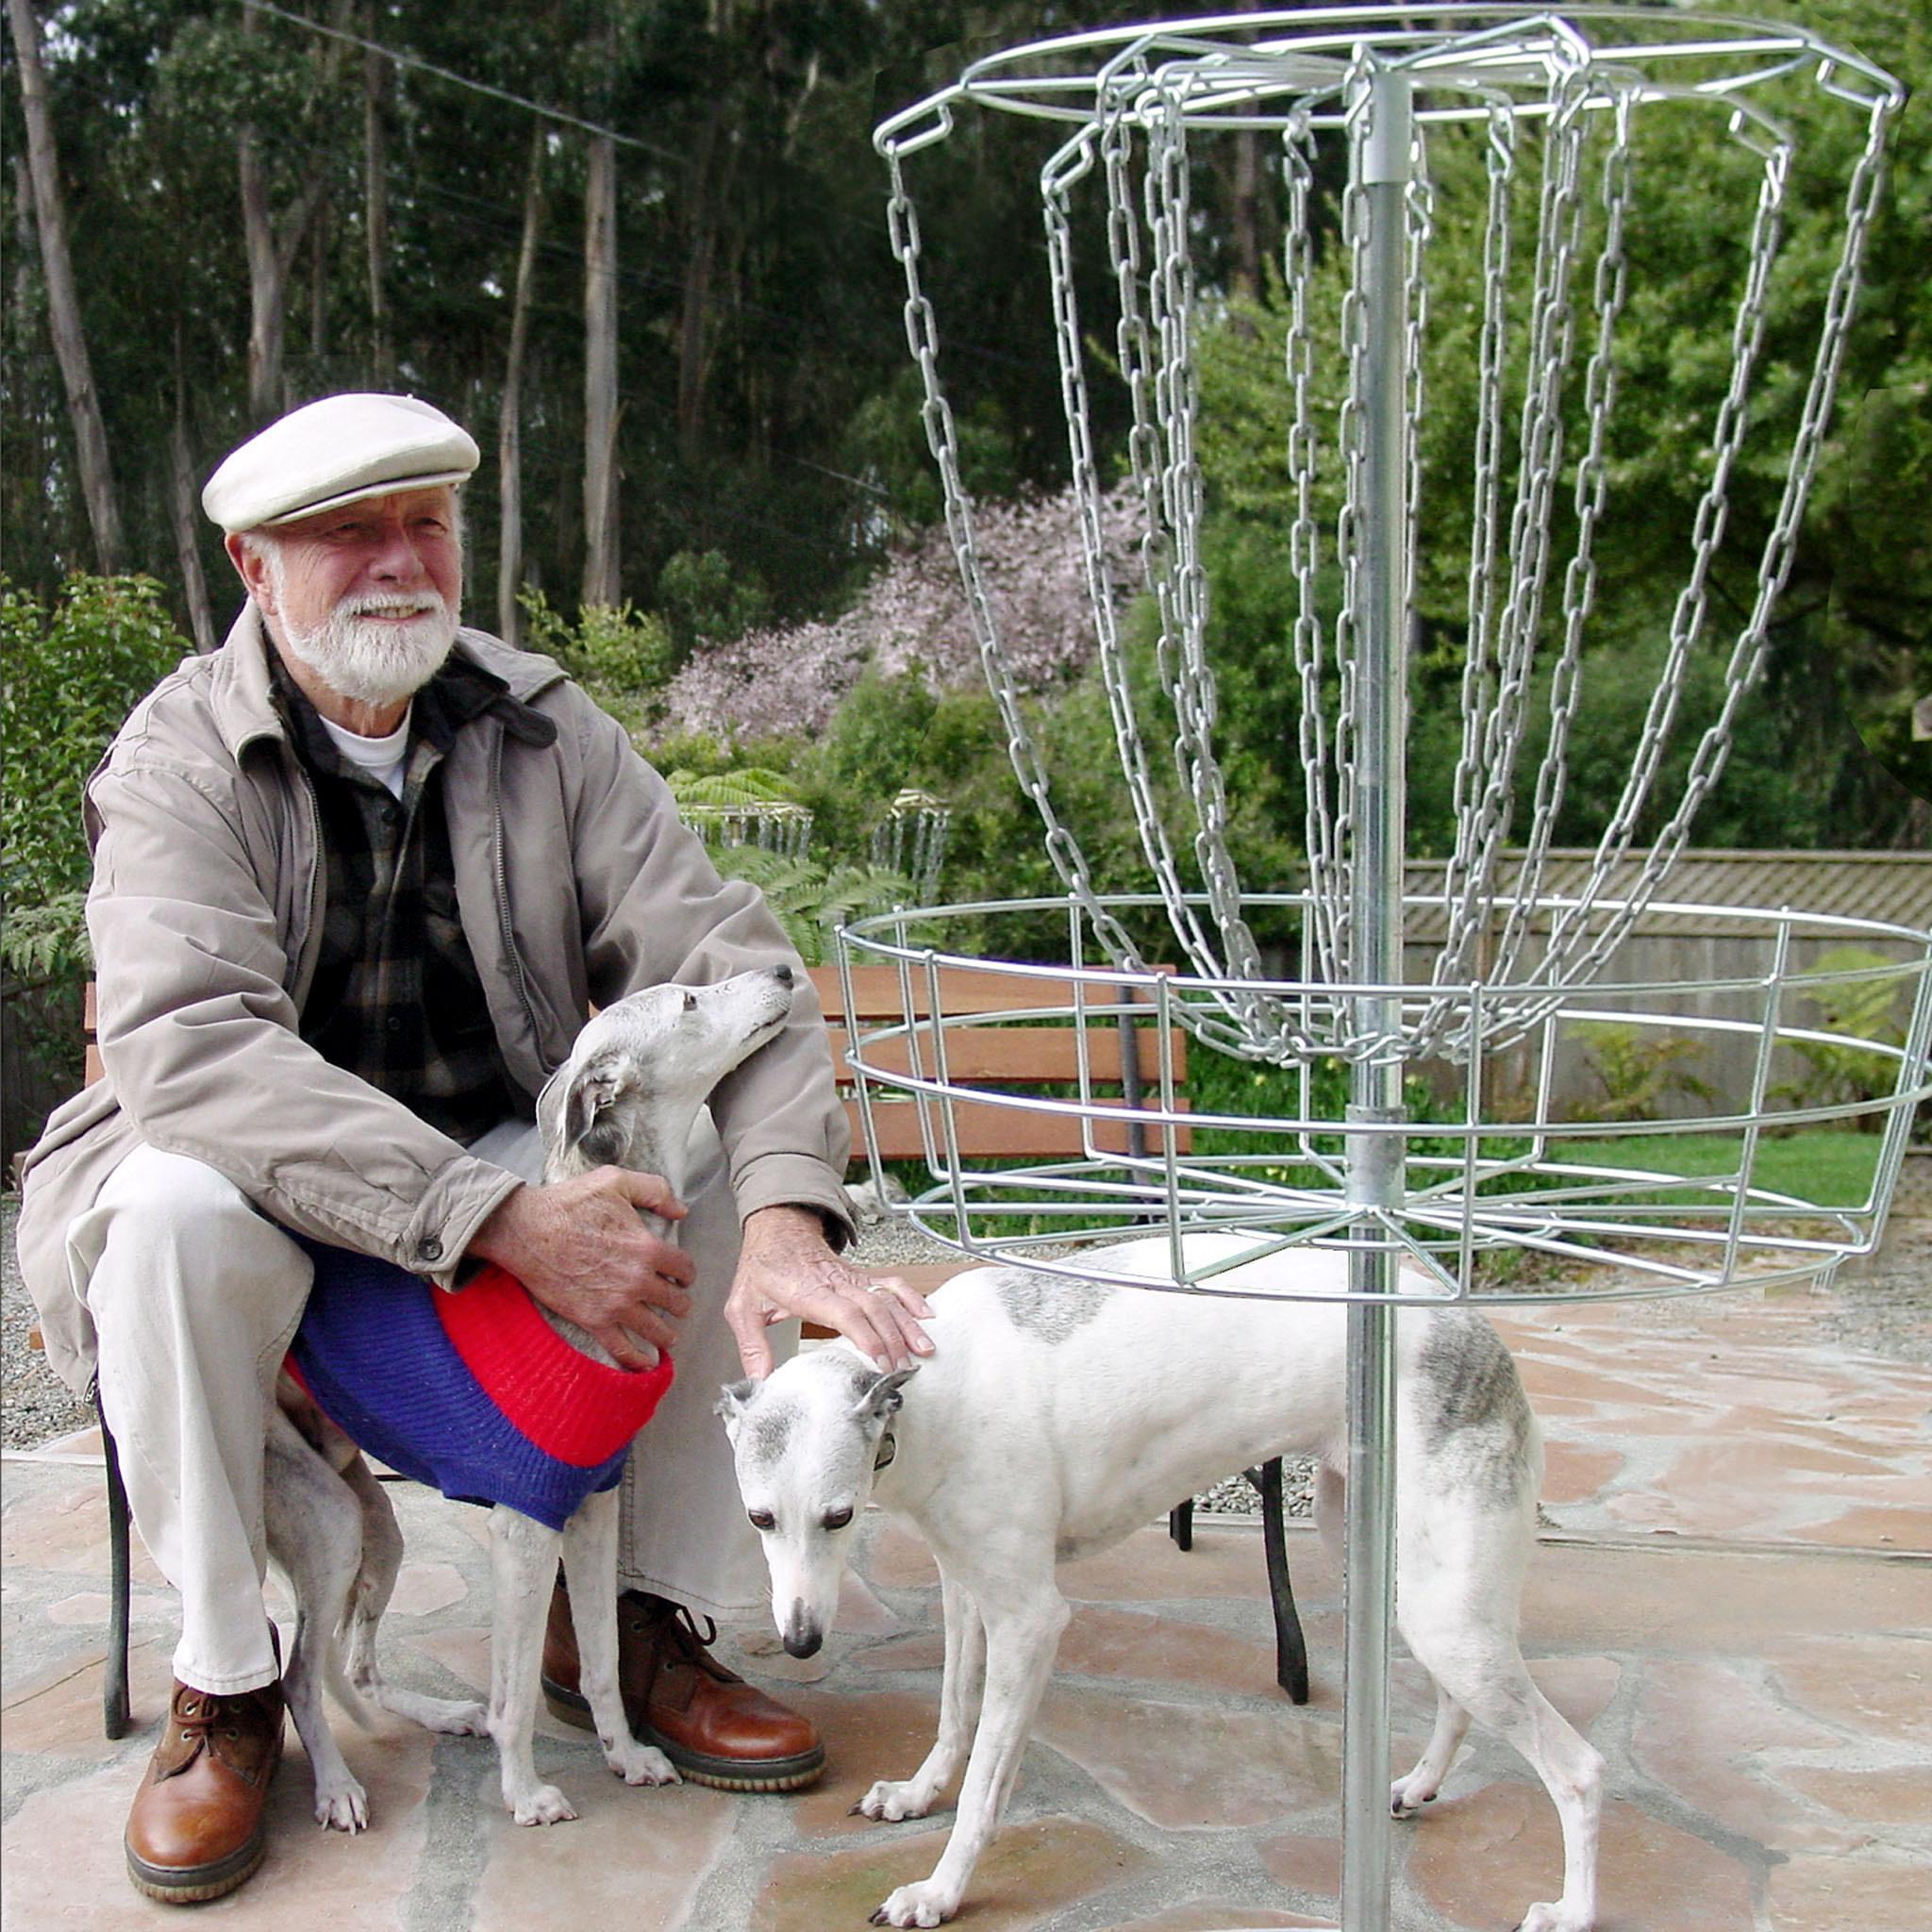 Ed Headrick posing with his dogs